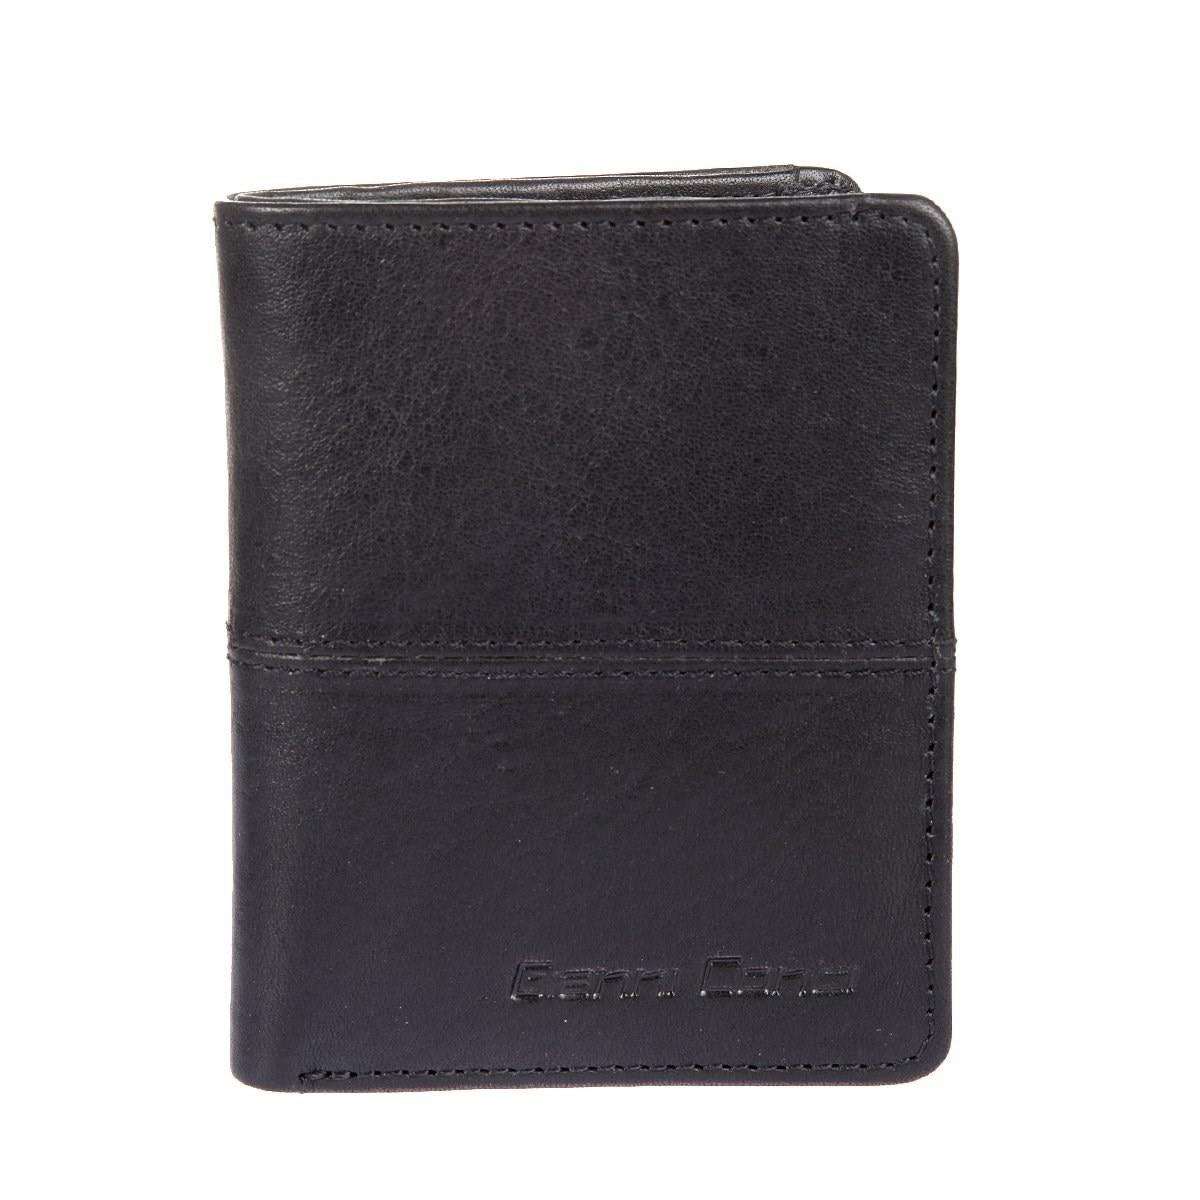 Coin Purse Gianni Conti 1137387E black 2017 hottest women short design gradient color coin purse cute ladies wallet bags pu leather handbags card holder clutch purse